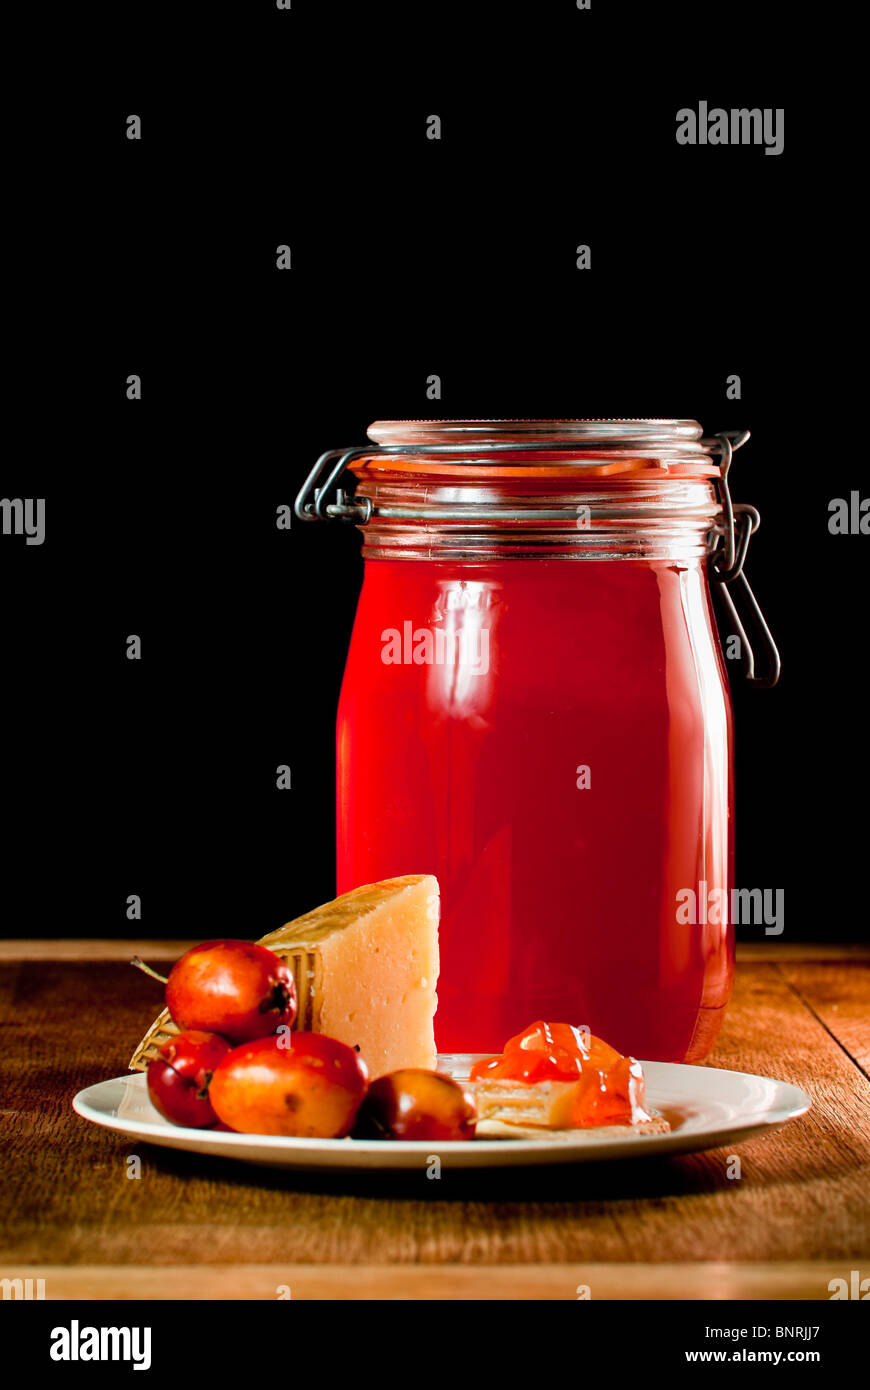 Food Still Life - Stock Image